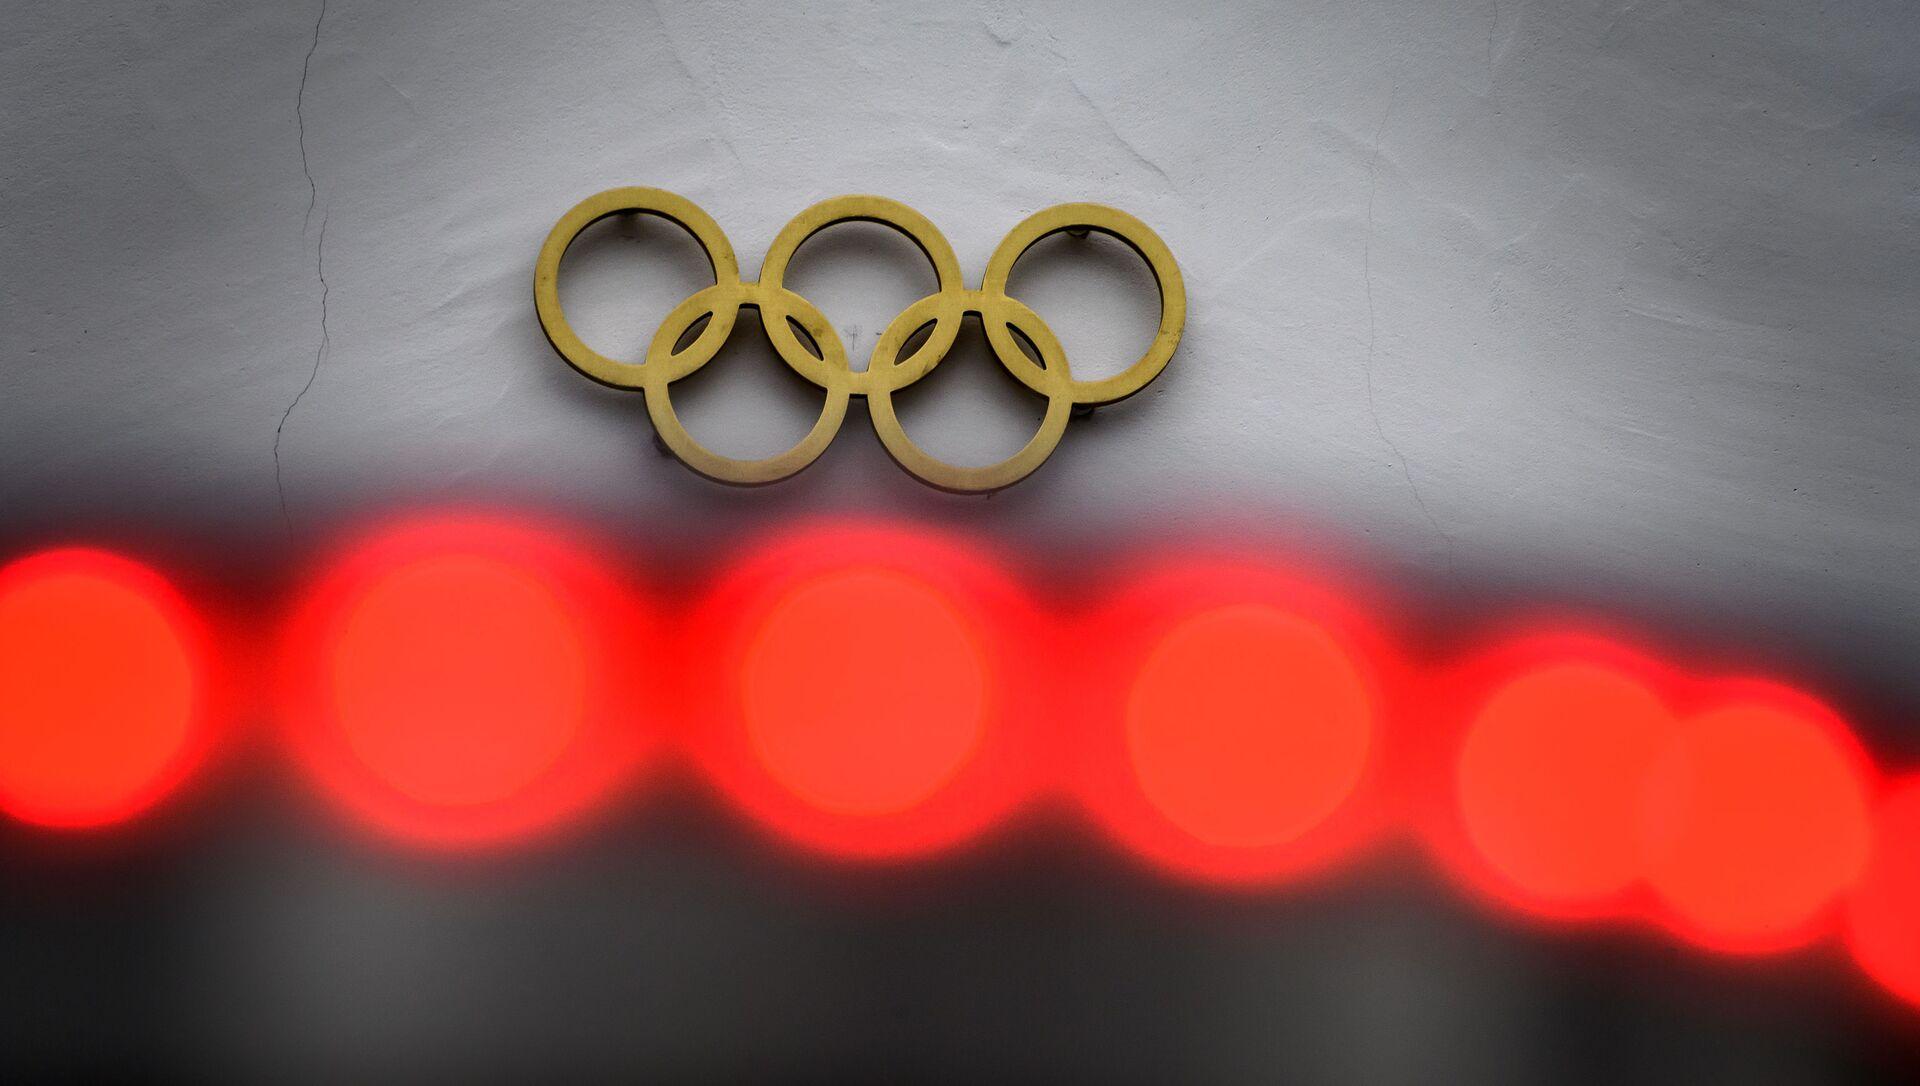 Логотип Олимпийских игр, фото из архива - Sputnik Azərbaycan, 1920, 22.08.2021